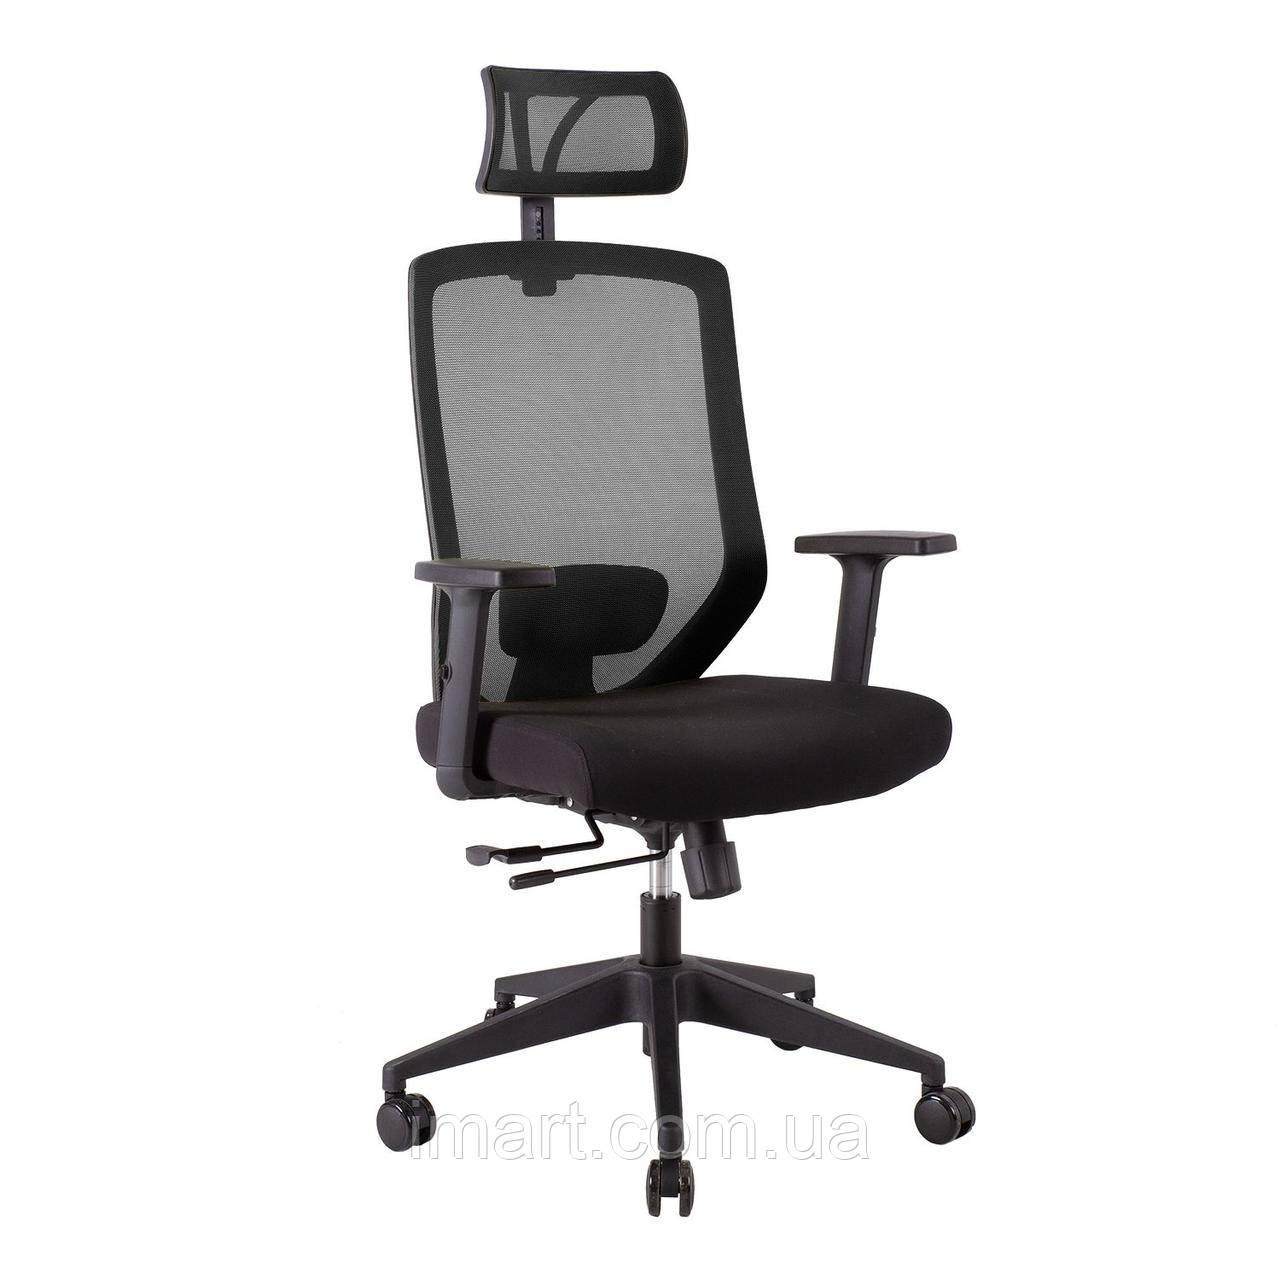 Офісне крісло Offce4You JOY black